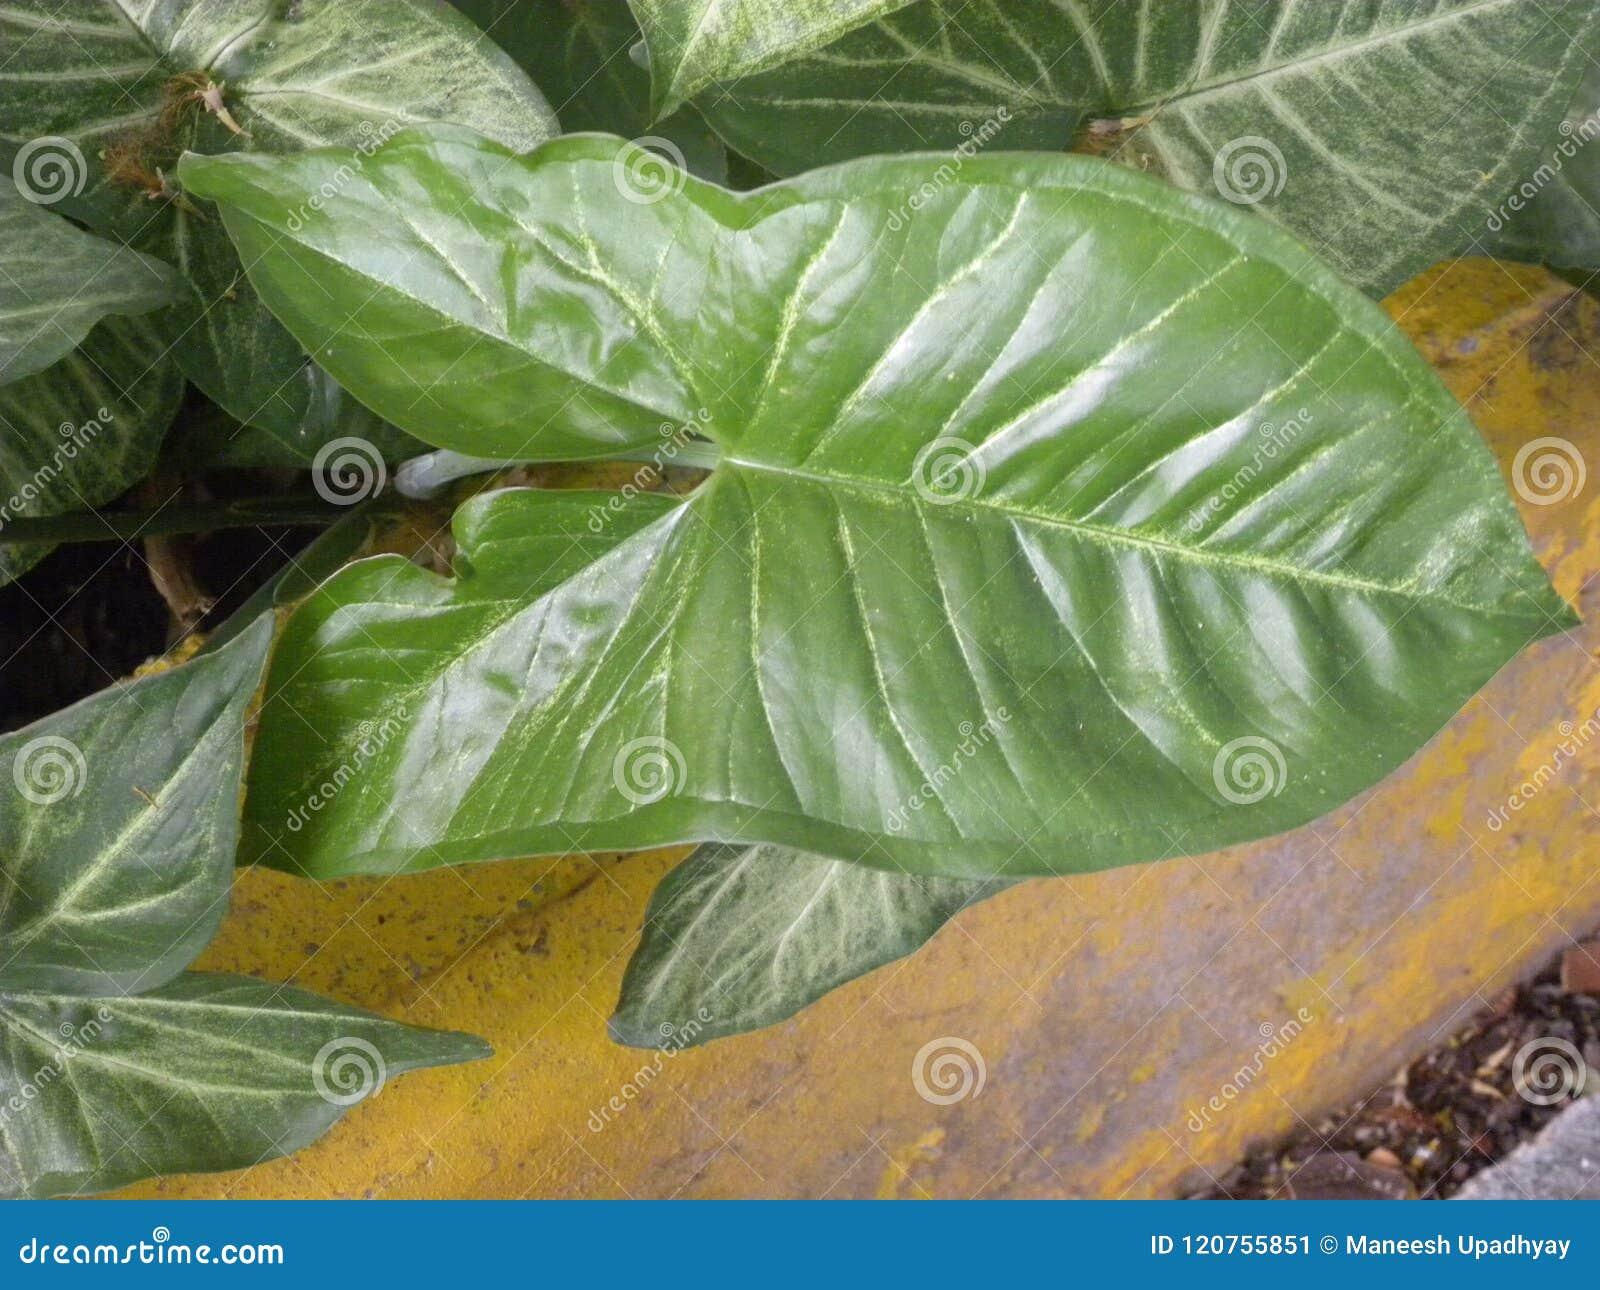 Big Dark Green Color Leaf Of Caladium Plant Stock Image - Image of ...